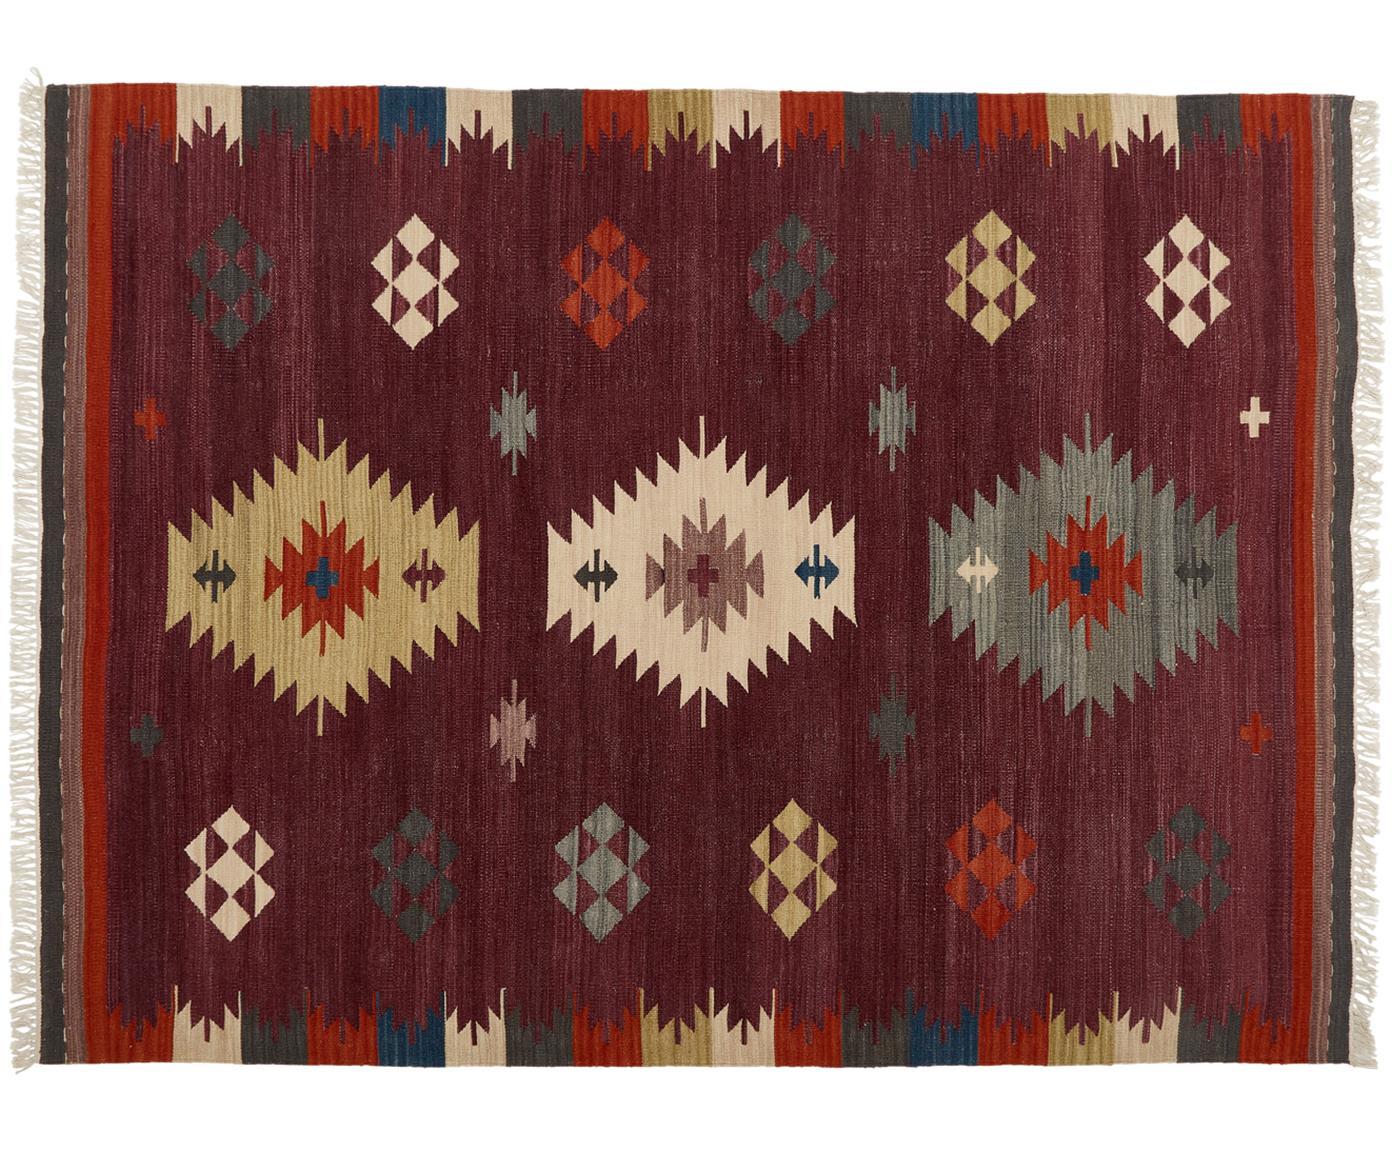 Handgewebter Kelimteppich Kilian aus Wolle, 100% Wolle, Dunkles Lila, Mehrfarbig, B 125 x L 185 cm (Größe S)